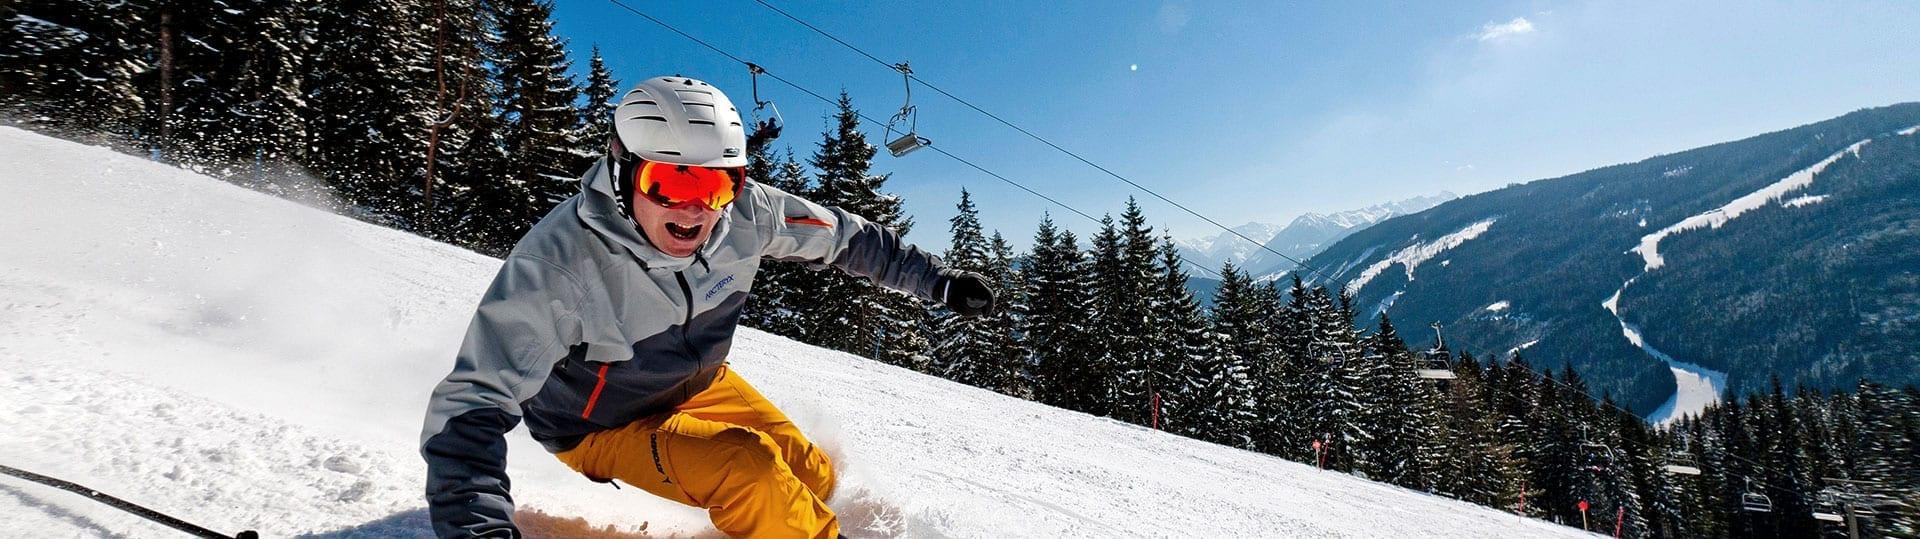 Skiurlaub-Angebote in Filzmoos